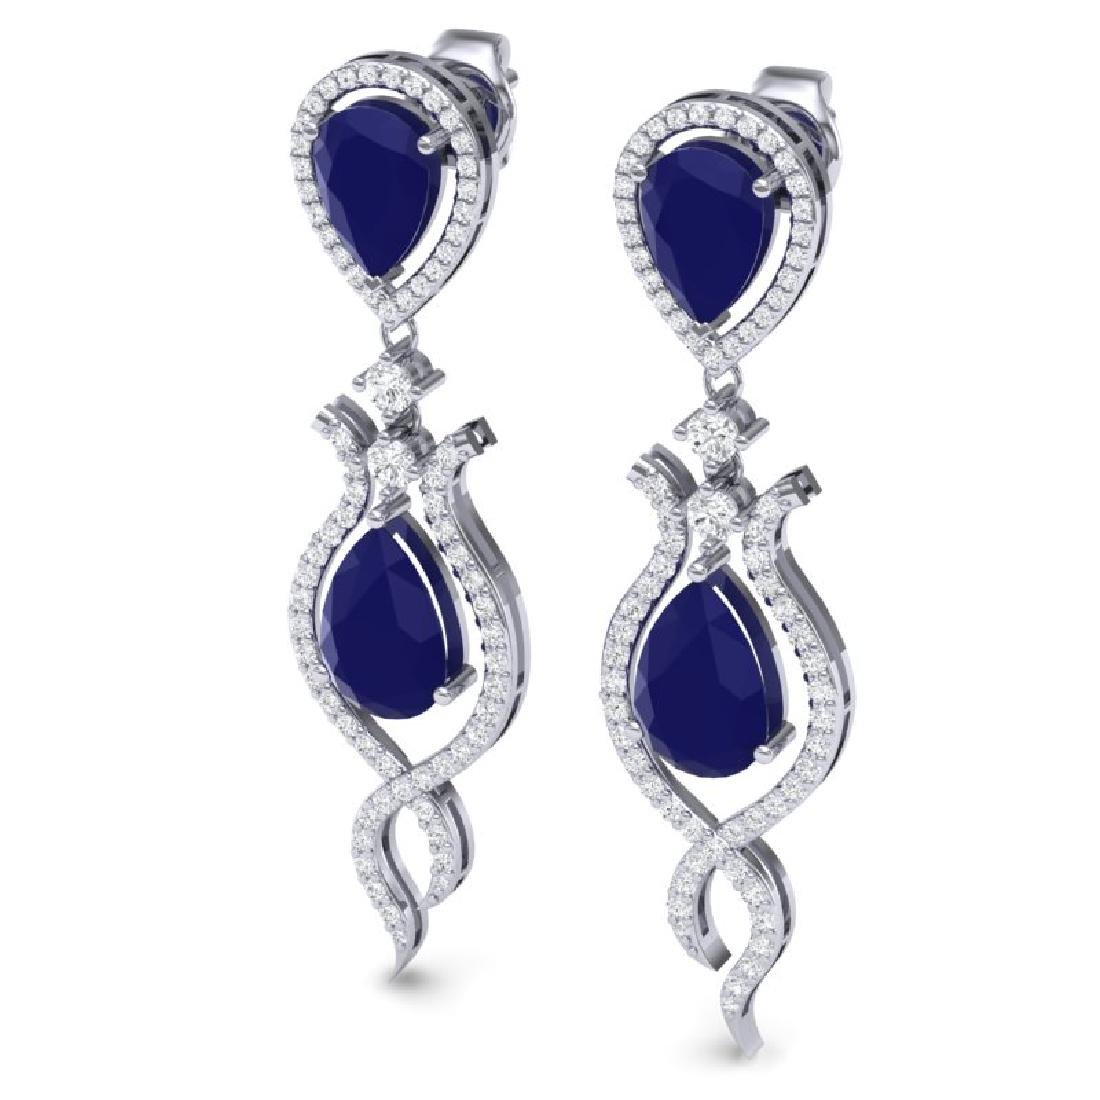 16.57 CTW Royalty Sapphire & VS Diamond Earrings 18K - 2